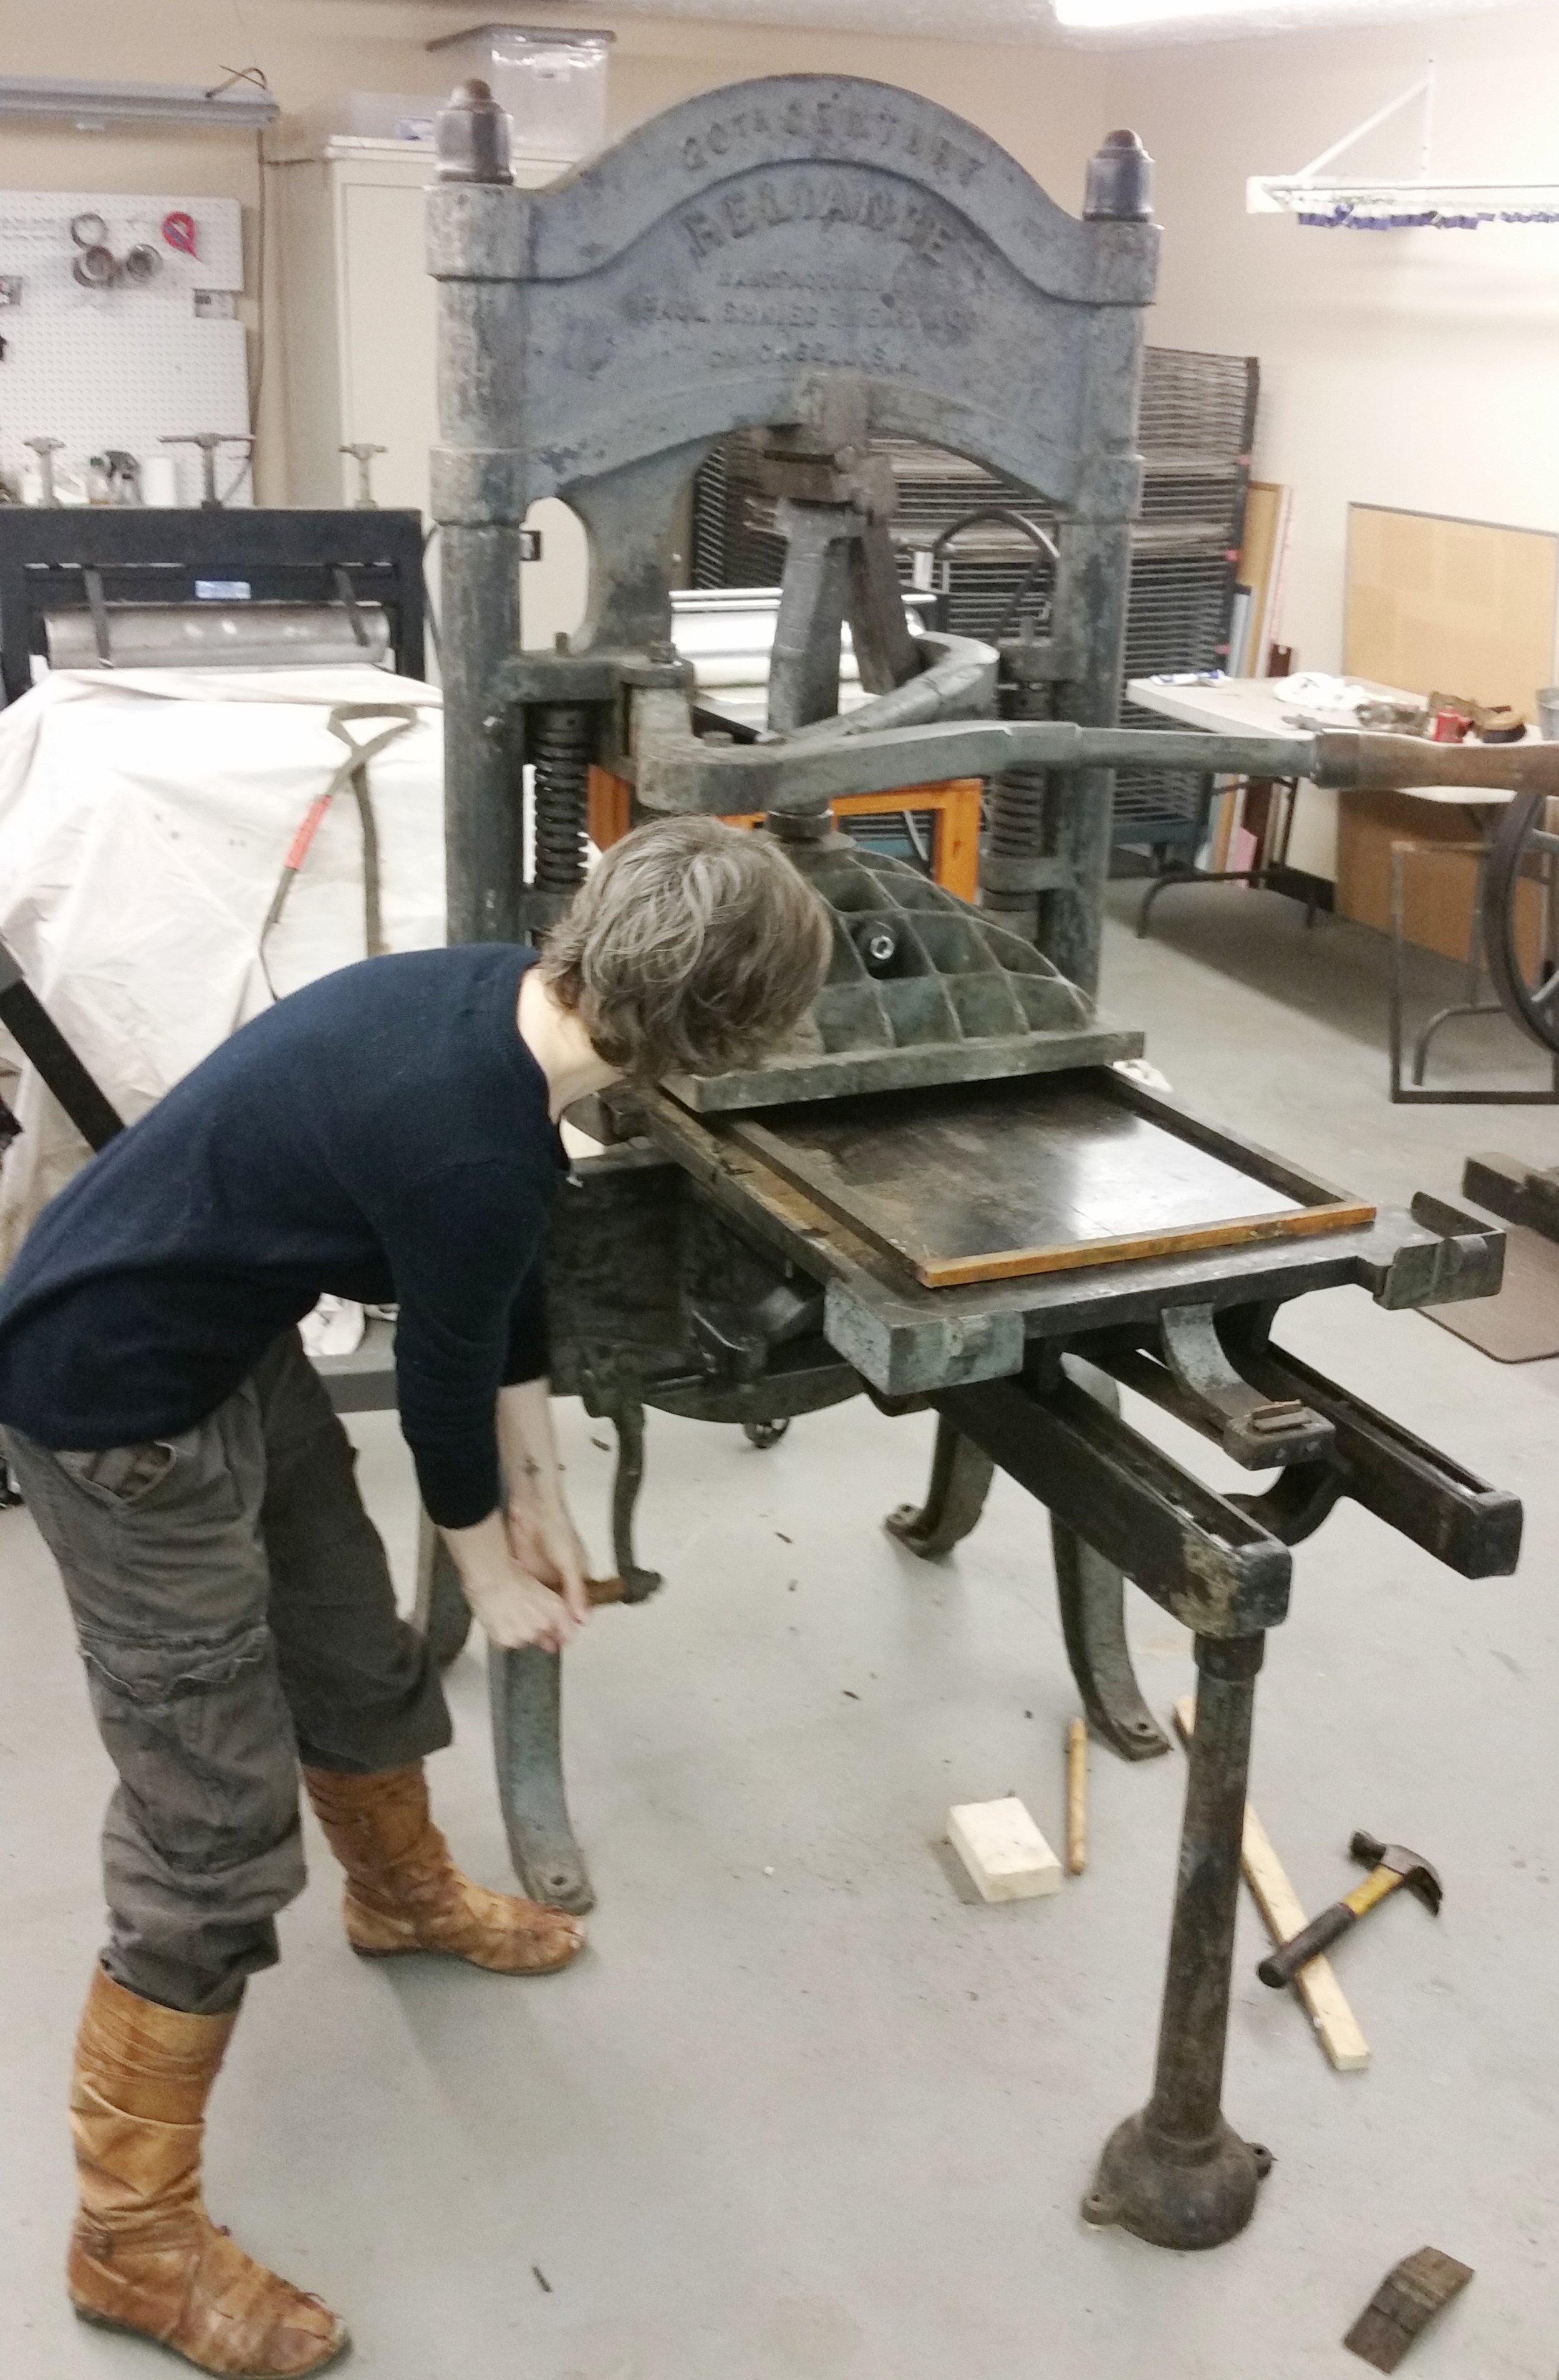 Dav testing the press bed slide action